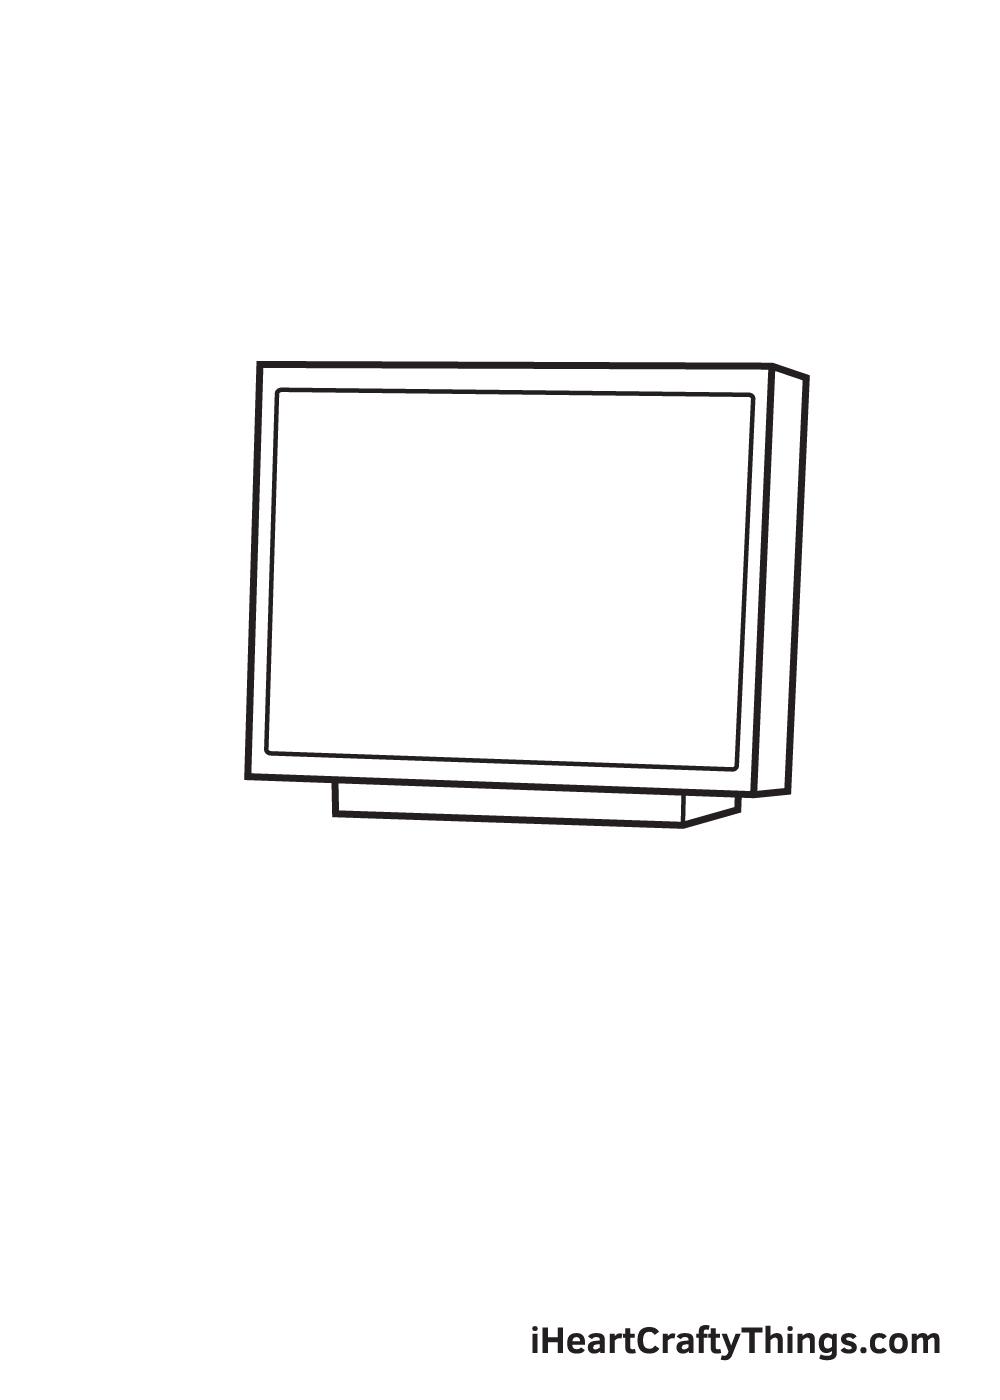 computer drawing - step 3